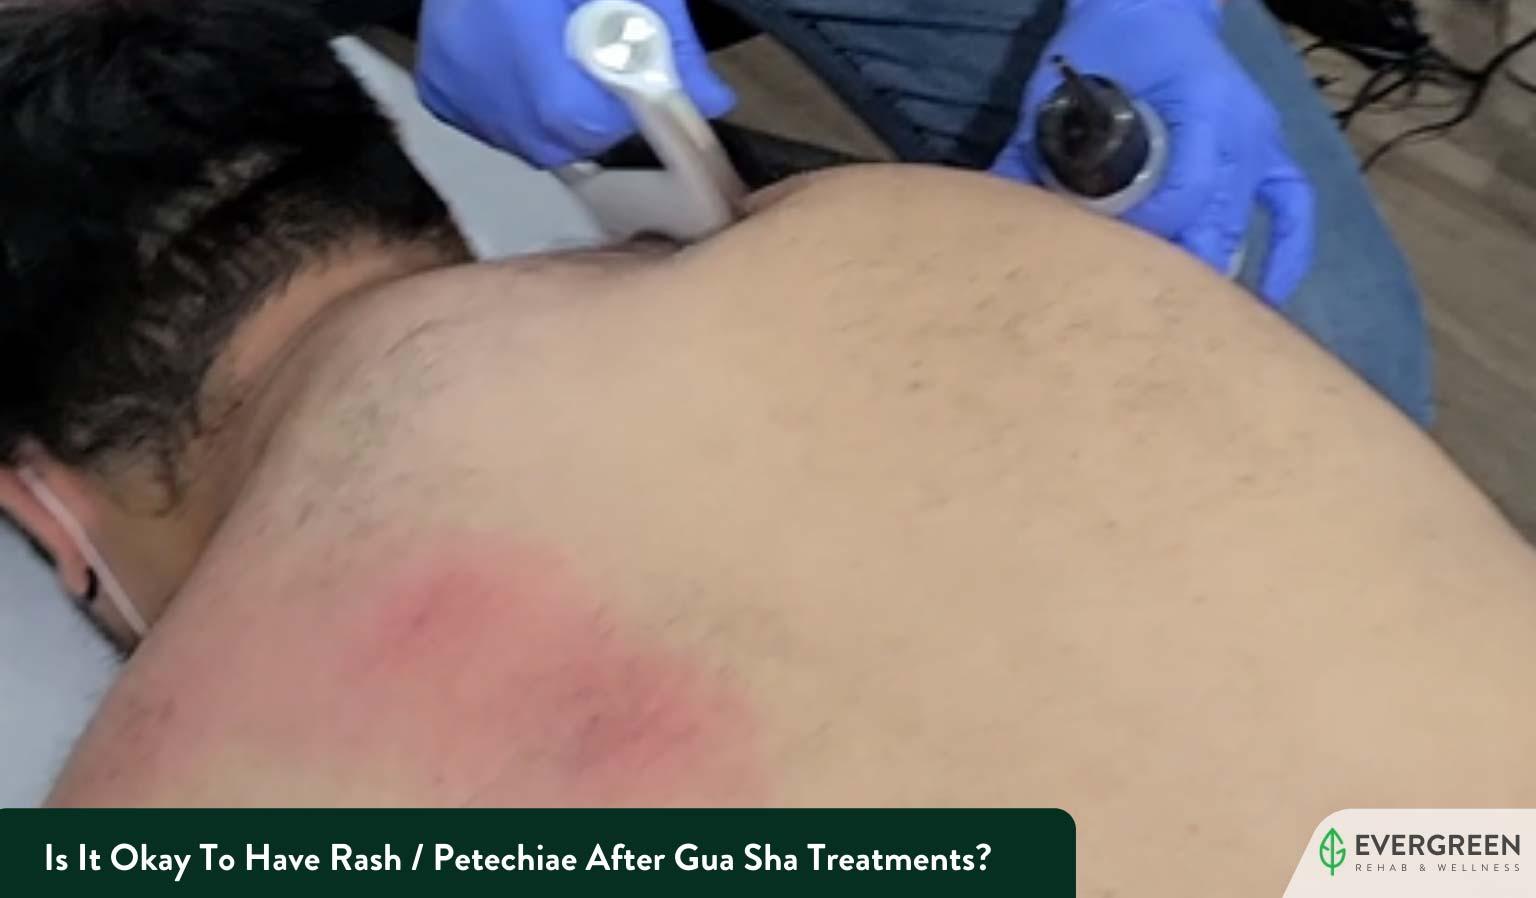 Is It Okay To Have Rash / Petechiae After Gua Sha Treatments?